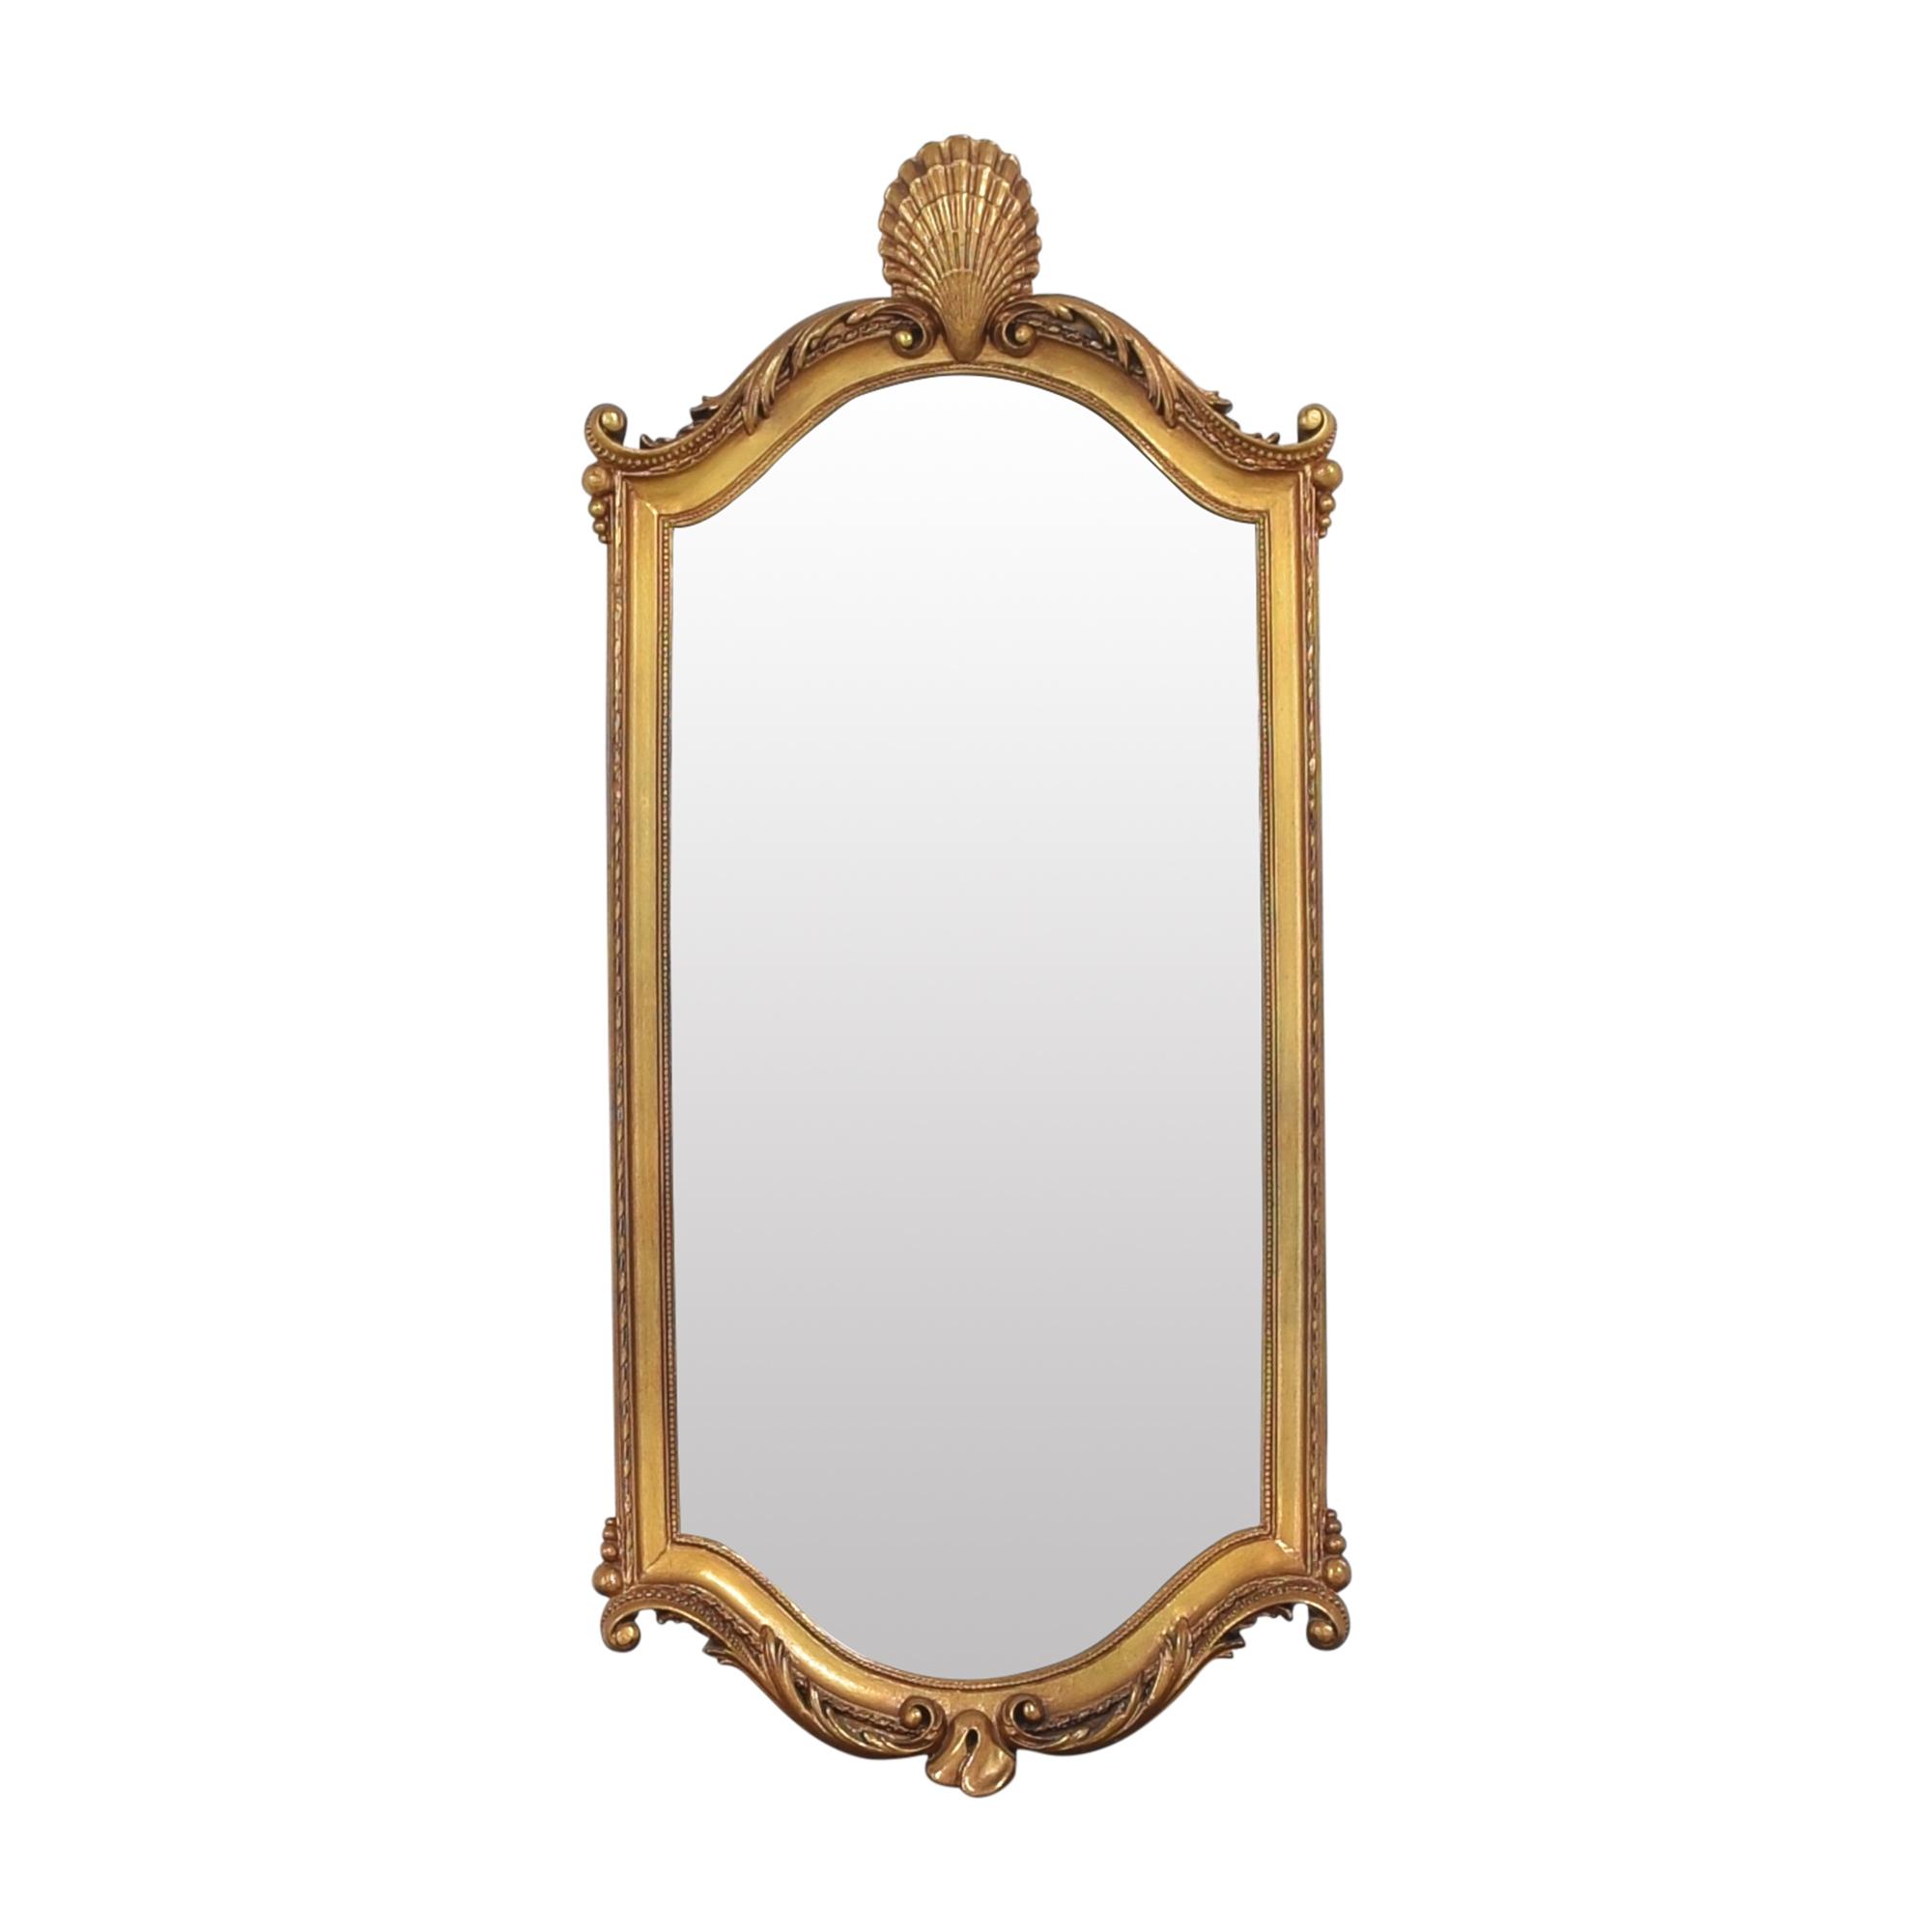 Ethan Allen Ethan Allen Decorative Wall Mirror discount